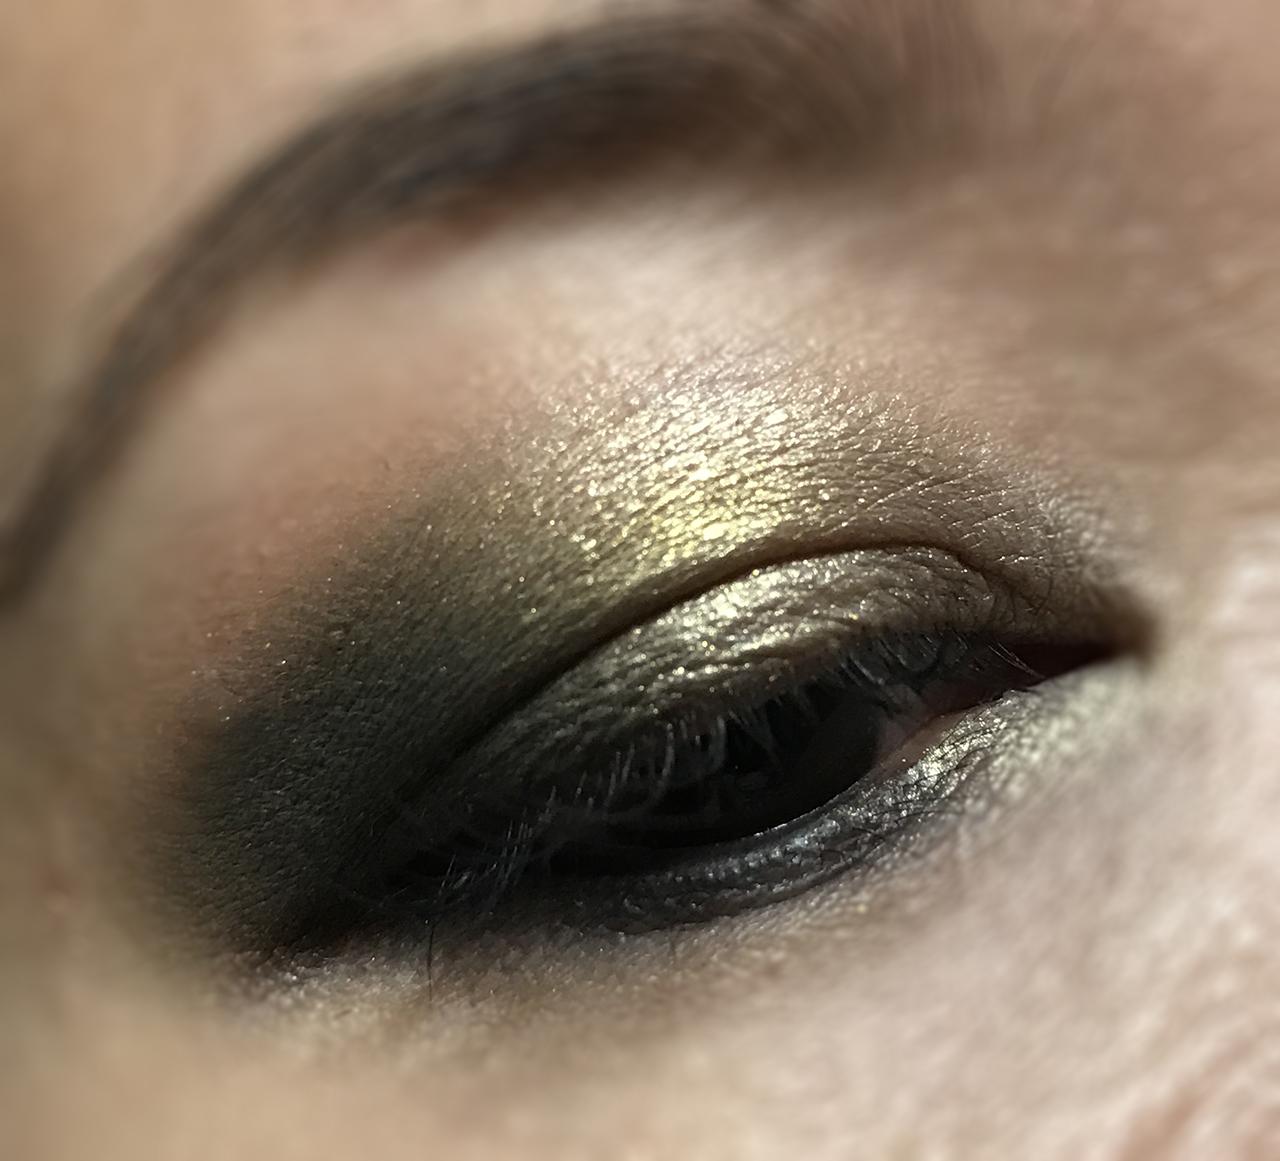 Marc Jacobs Eye-conic Multi-finish Eye Palette Edgitorial Eye makeup look